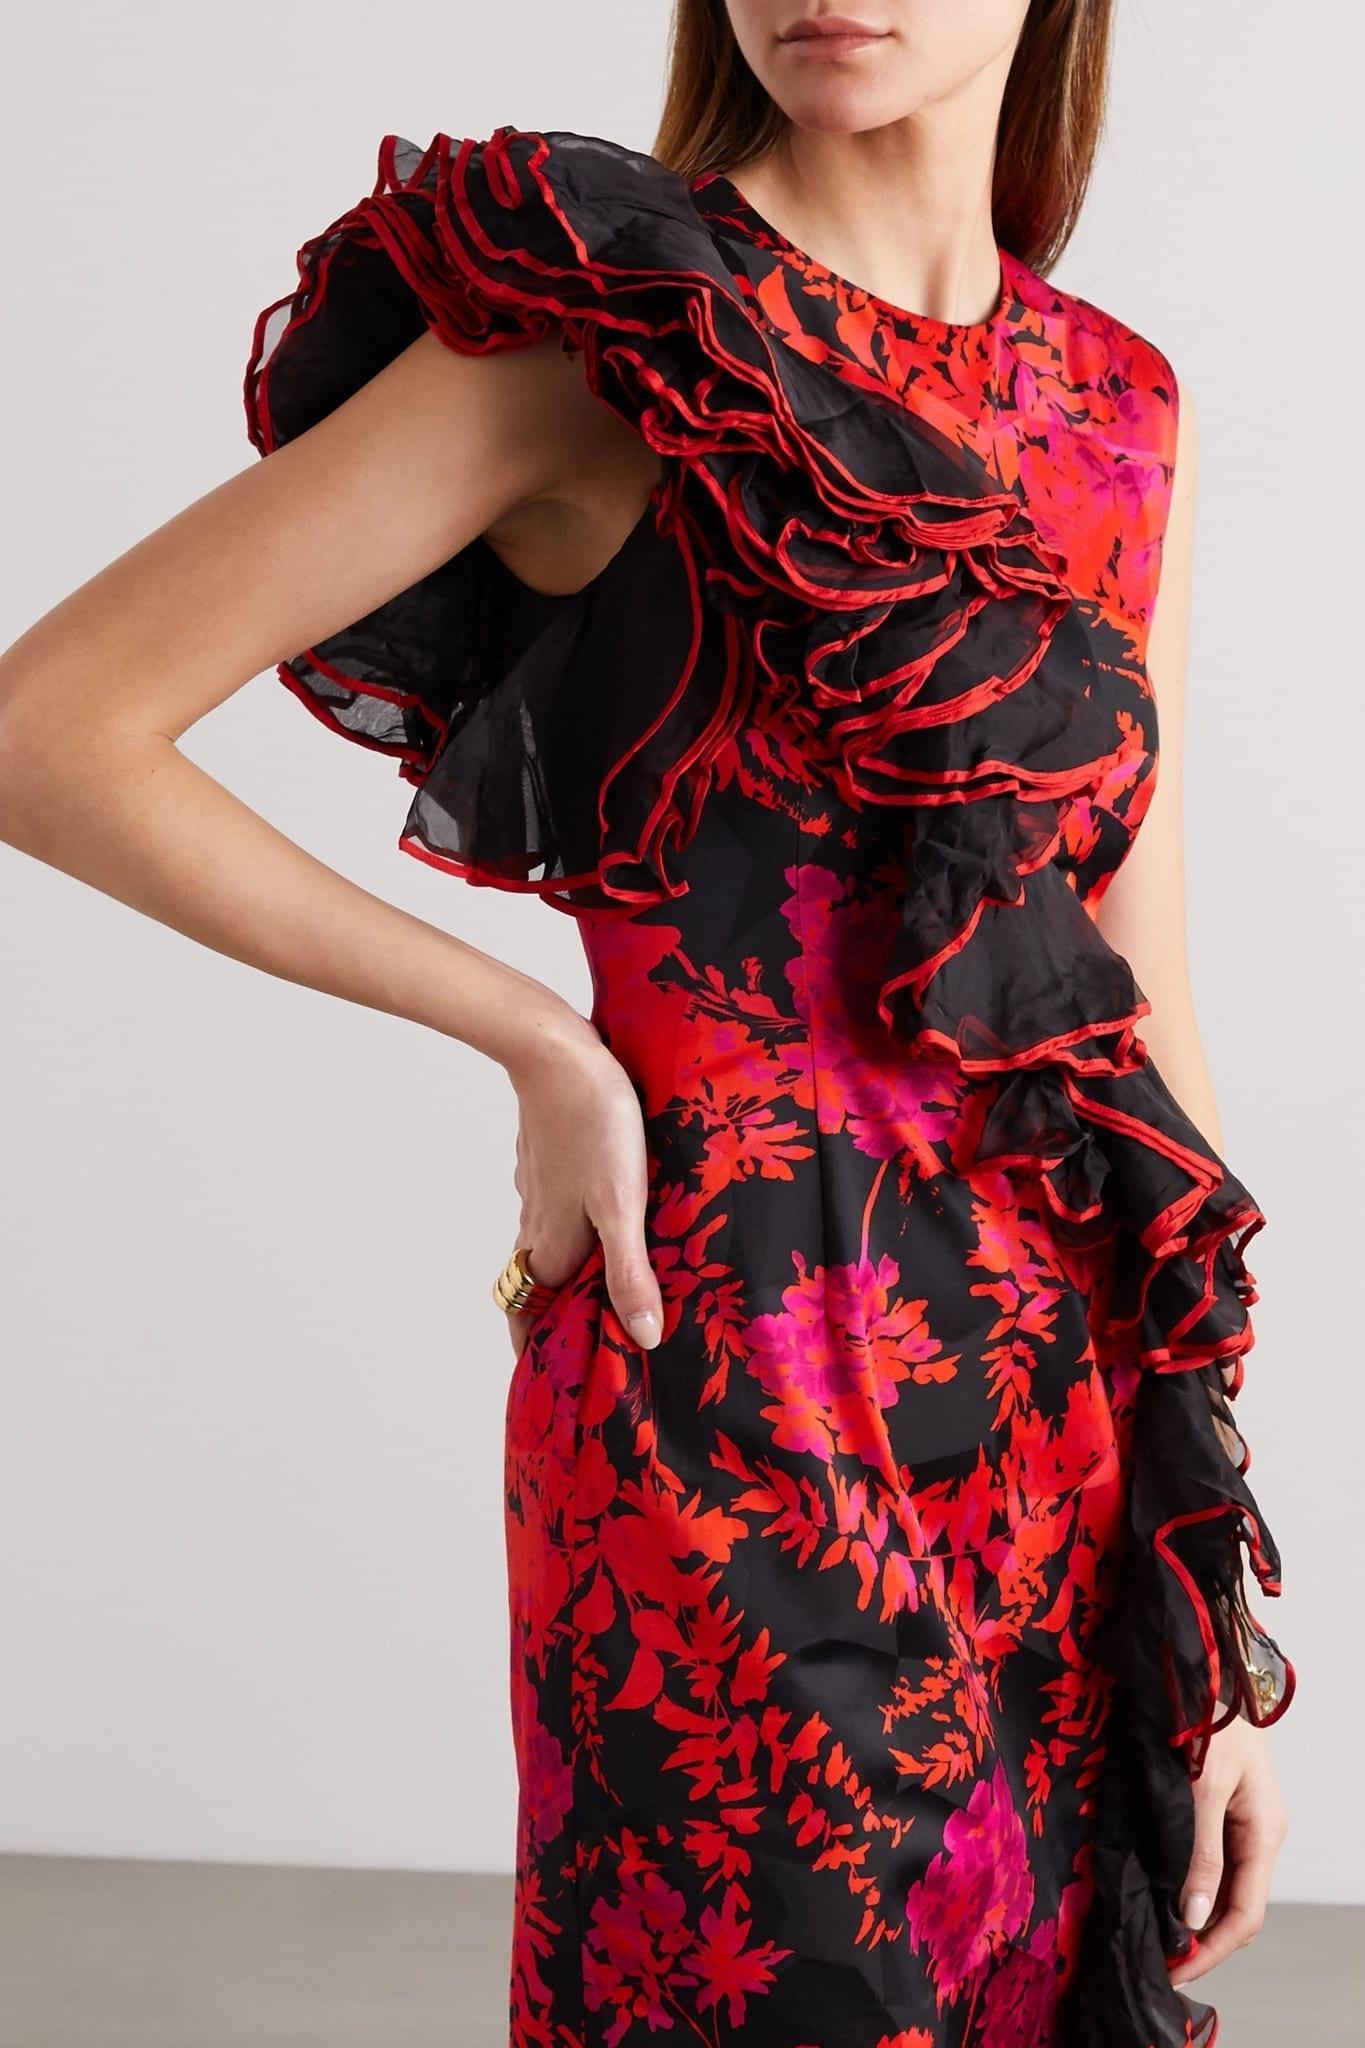 DRIES VAN NOTEN Durley Ruffled Organza-trimmed Floral-print Cotton-blend Midi Dress